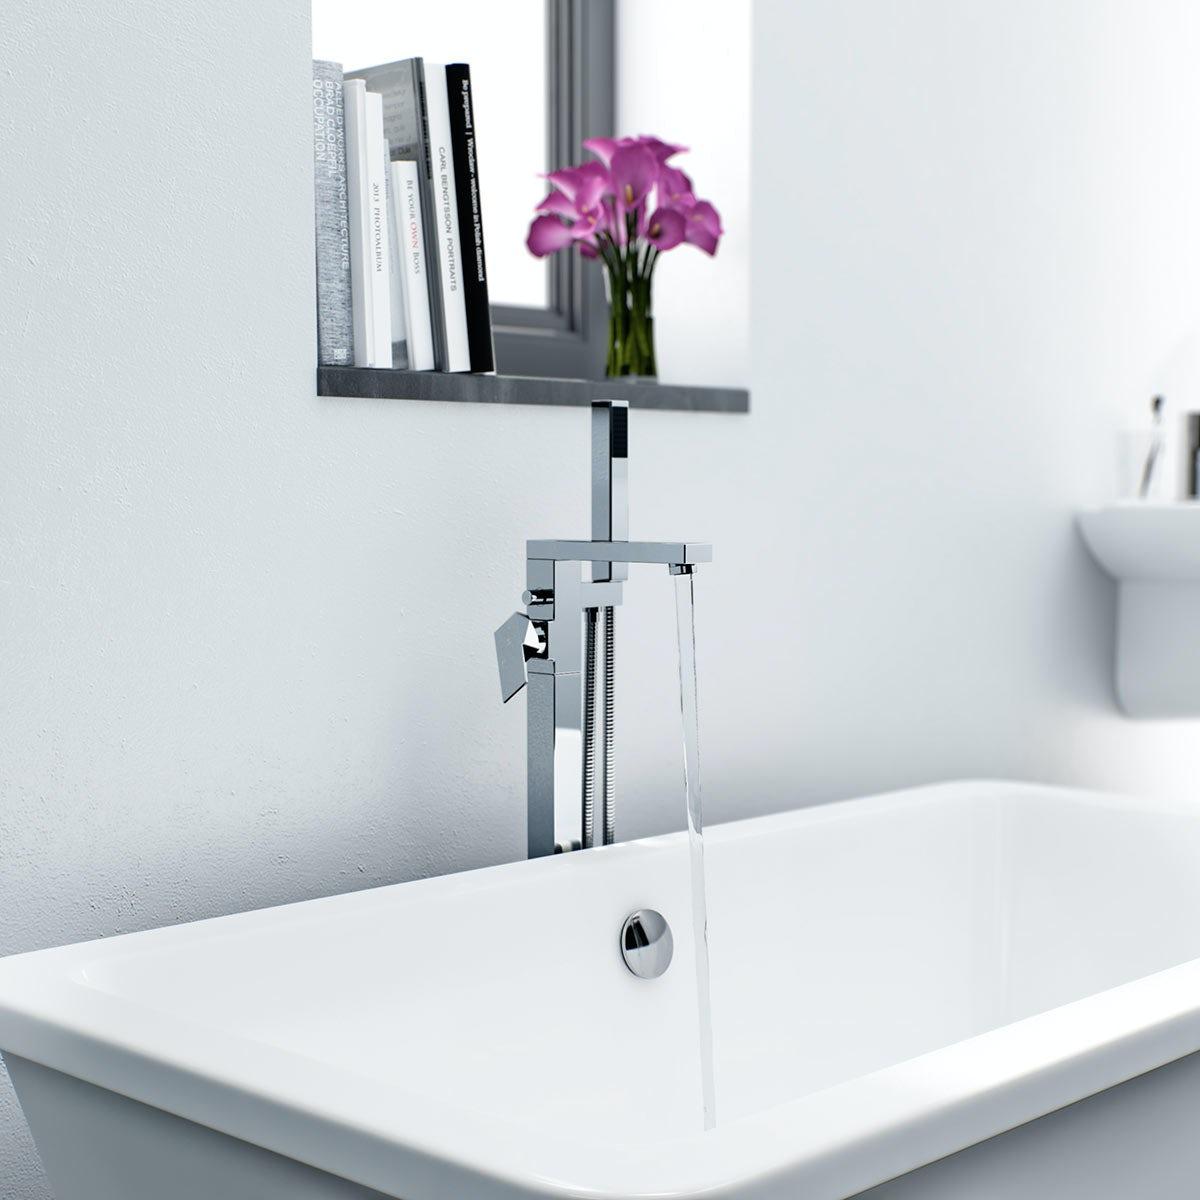 freestanding bath filler cratem com mode ellis freestanding bath filler victoriaplum